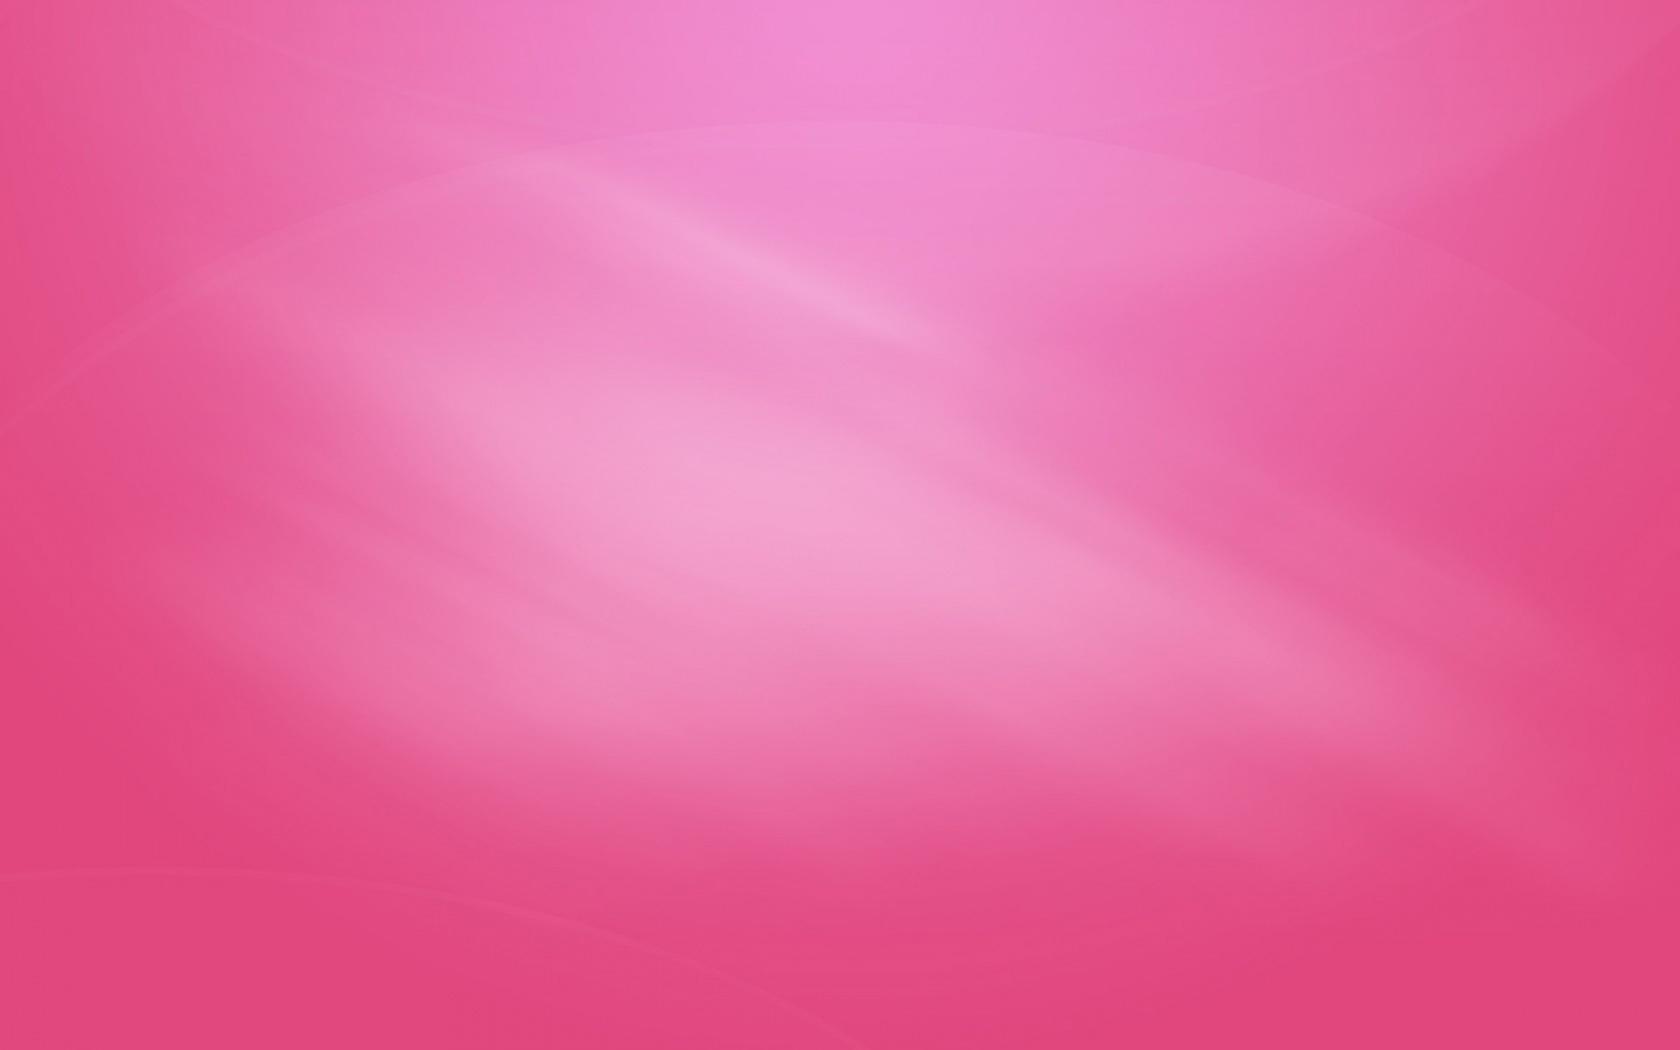 pink wallpaper 46457